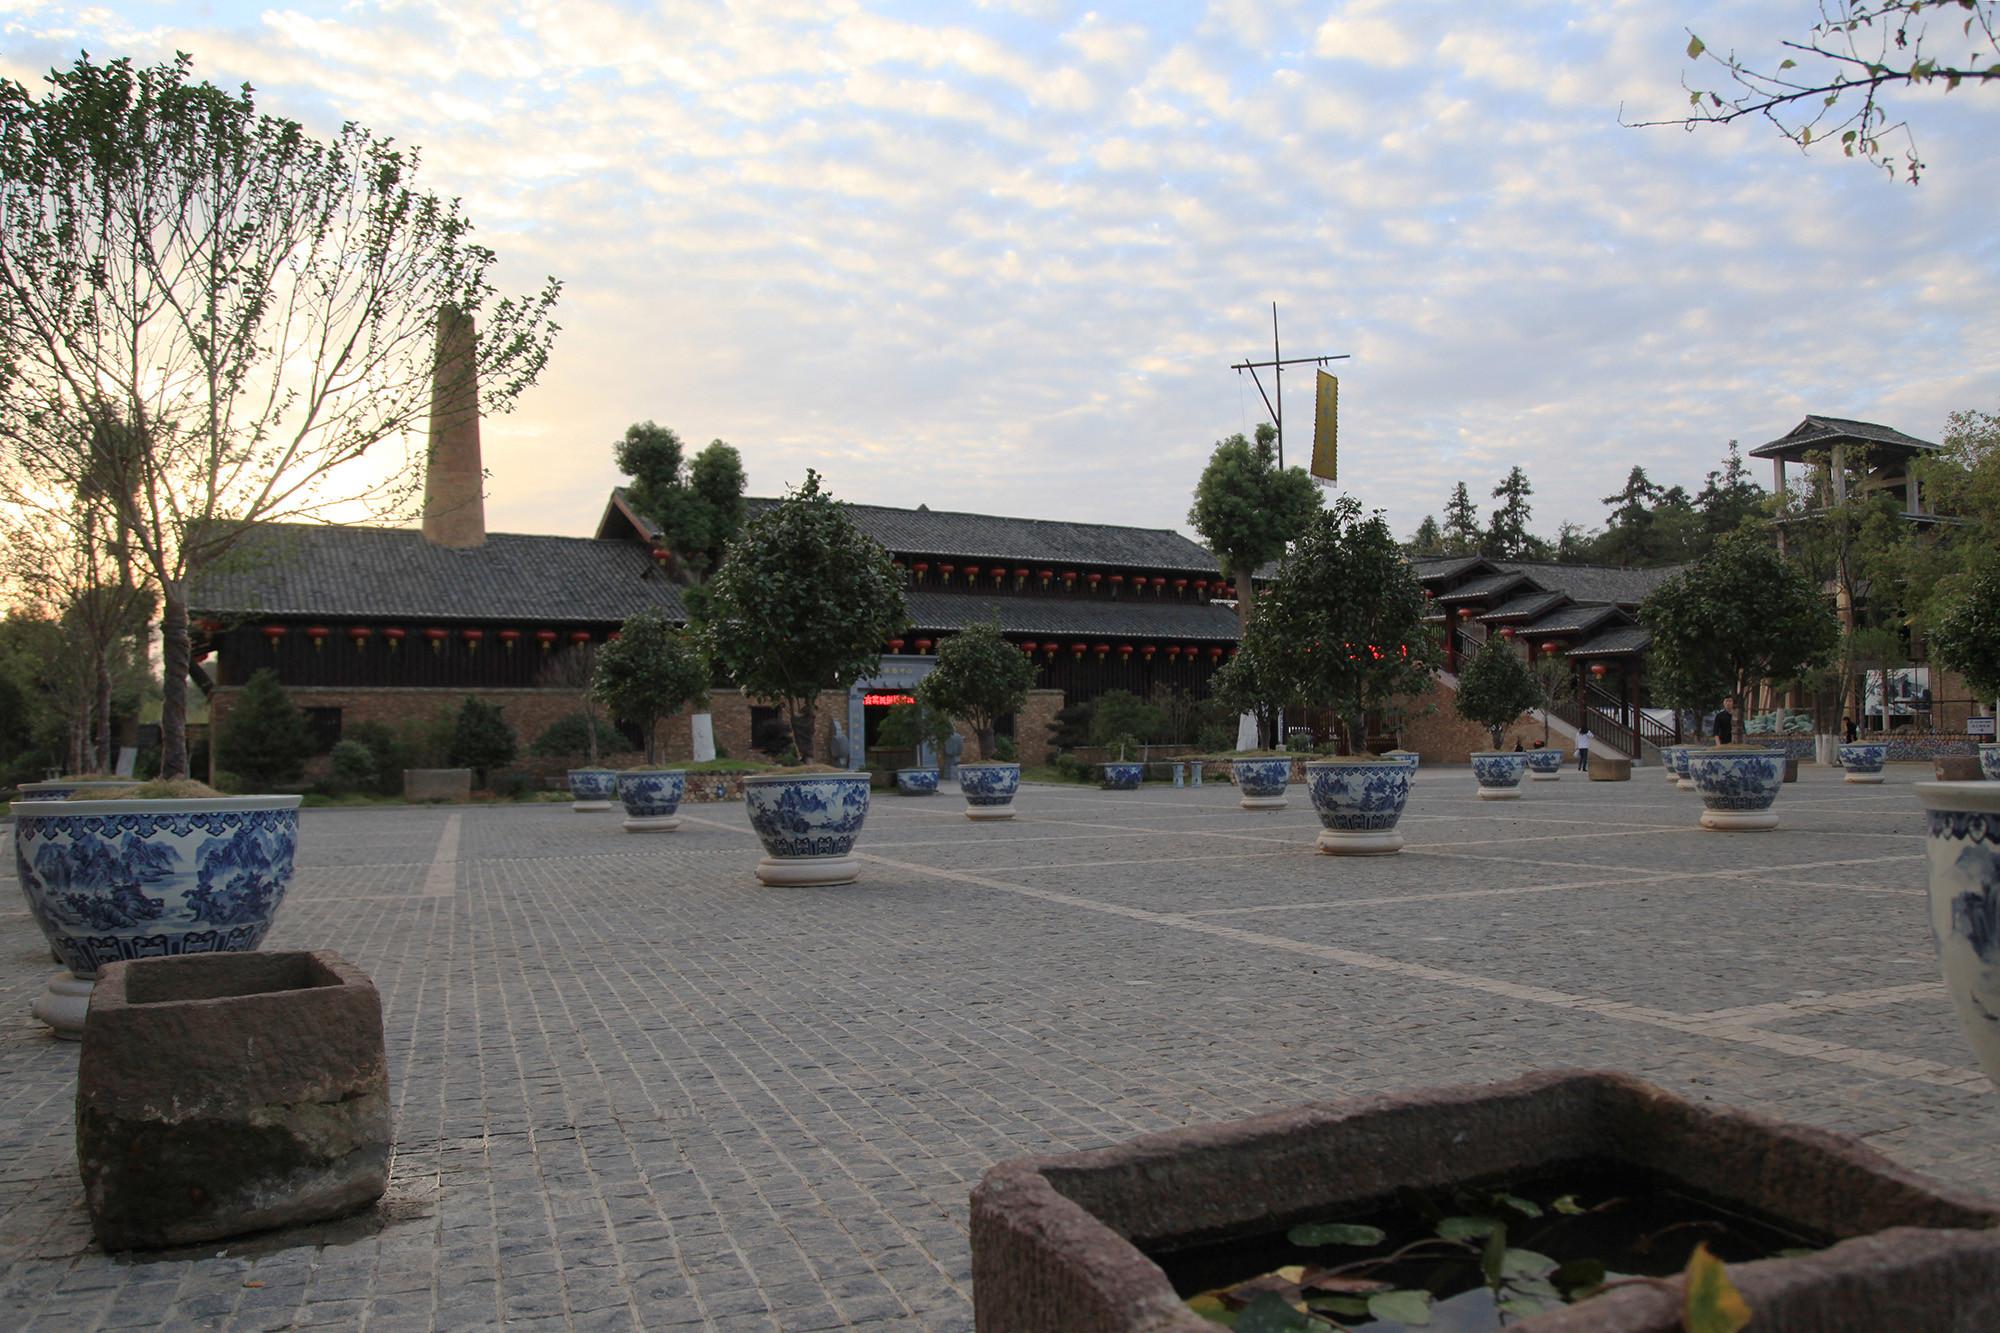 Endless Love Of Porcelain / Tongheshanzhi Landscape Design Co